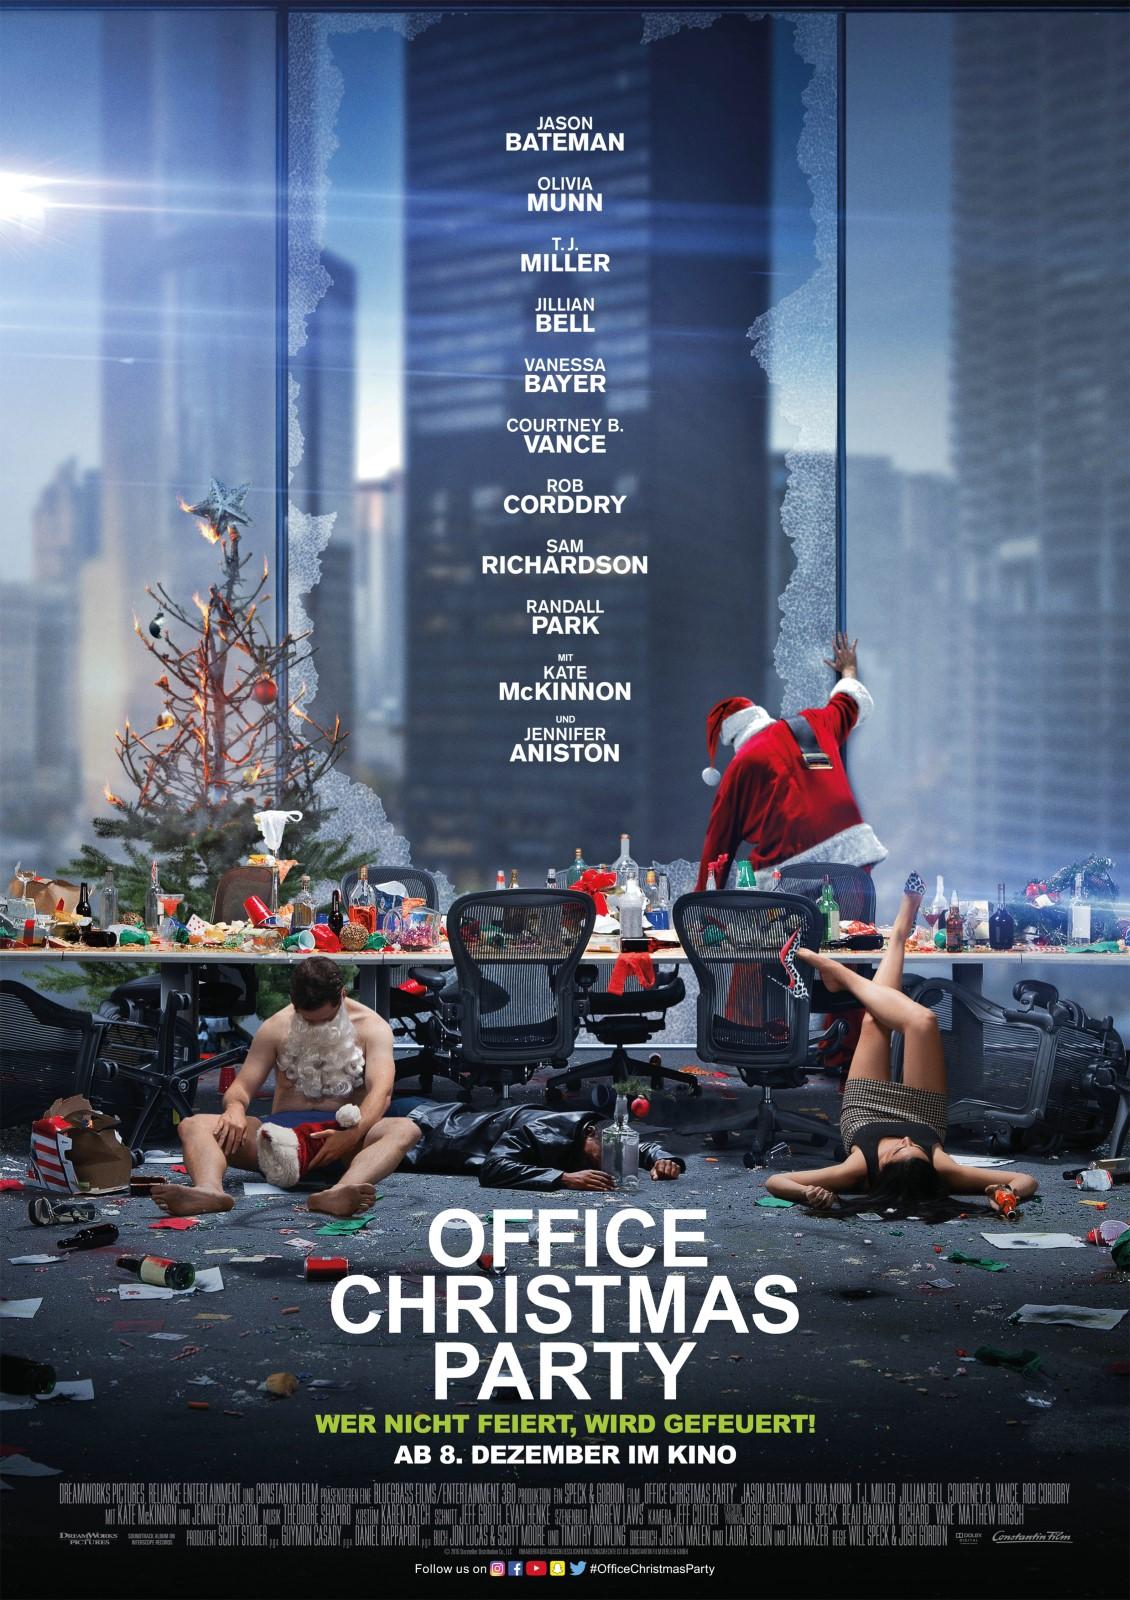 Office Christmas Party - Film 2016 - FILMSTARTS.de